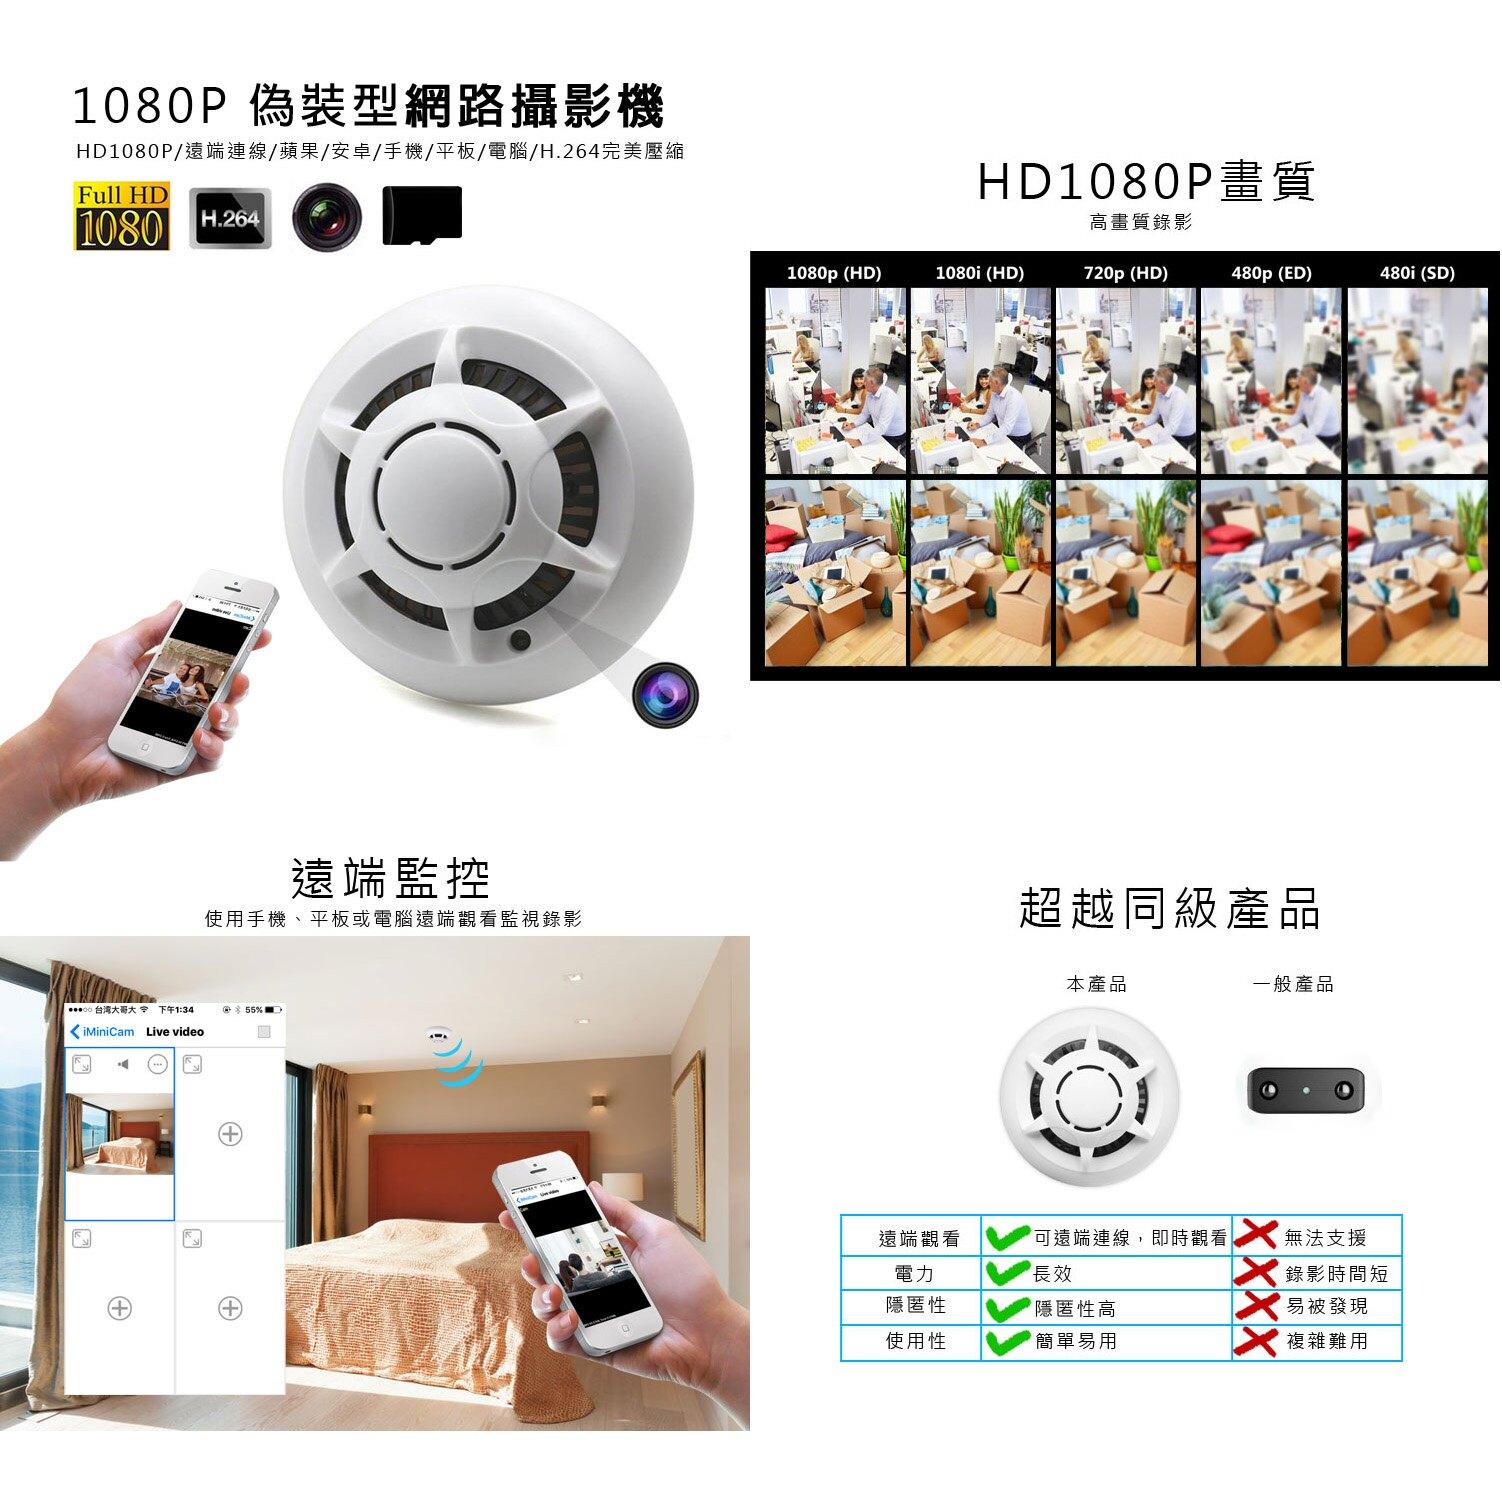 1080P偽裝型網路攝影機 遠端連線 即時錄影 平板/手機/電腦